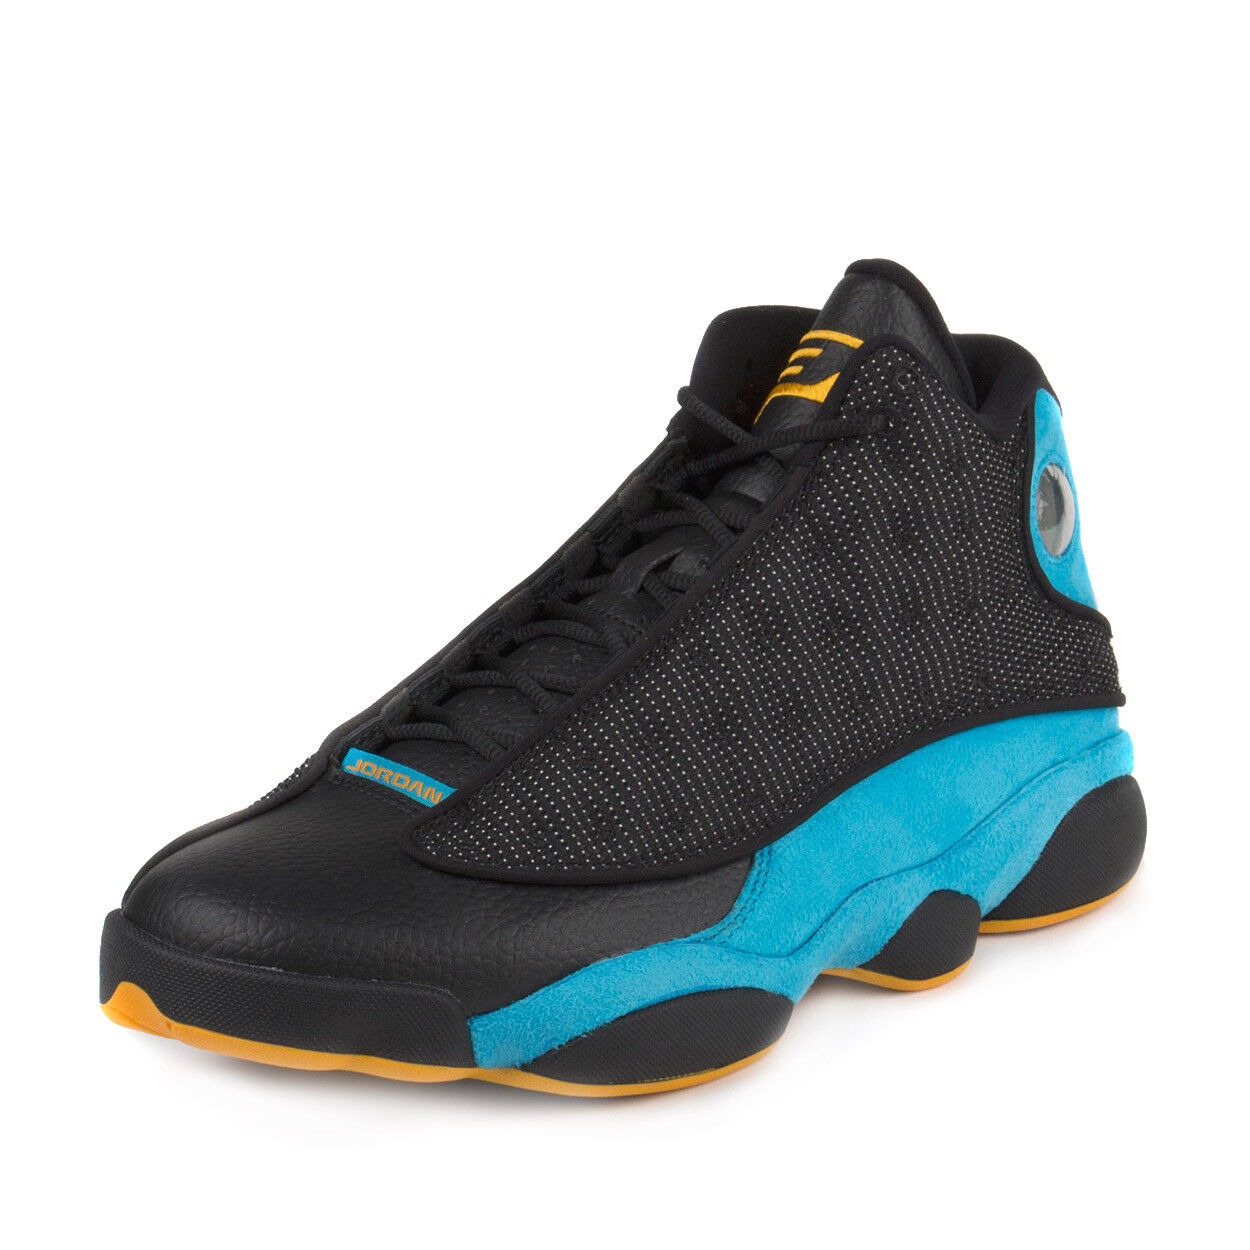 newest ca4d2 ded00 Nike Mens Air Jordan 13 Retro CP PE PE PE CP3 Black Sunstone-Orion